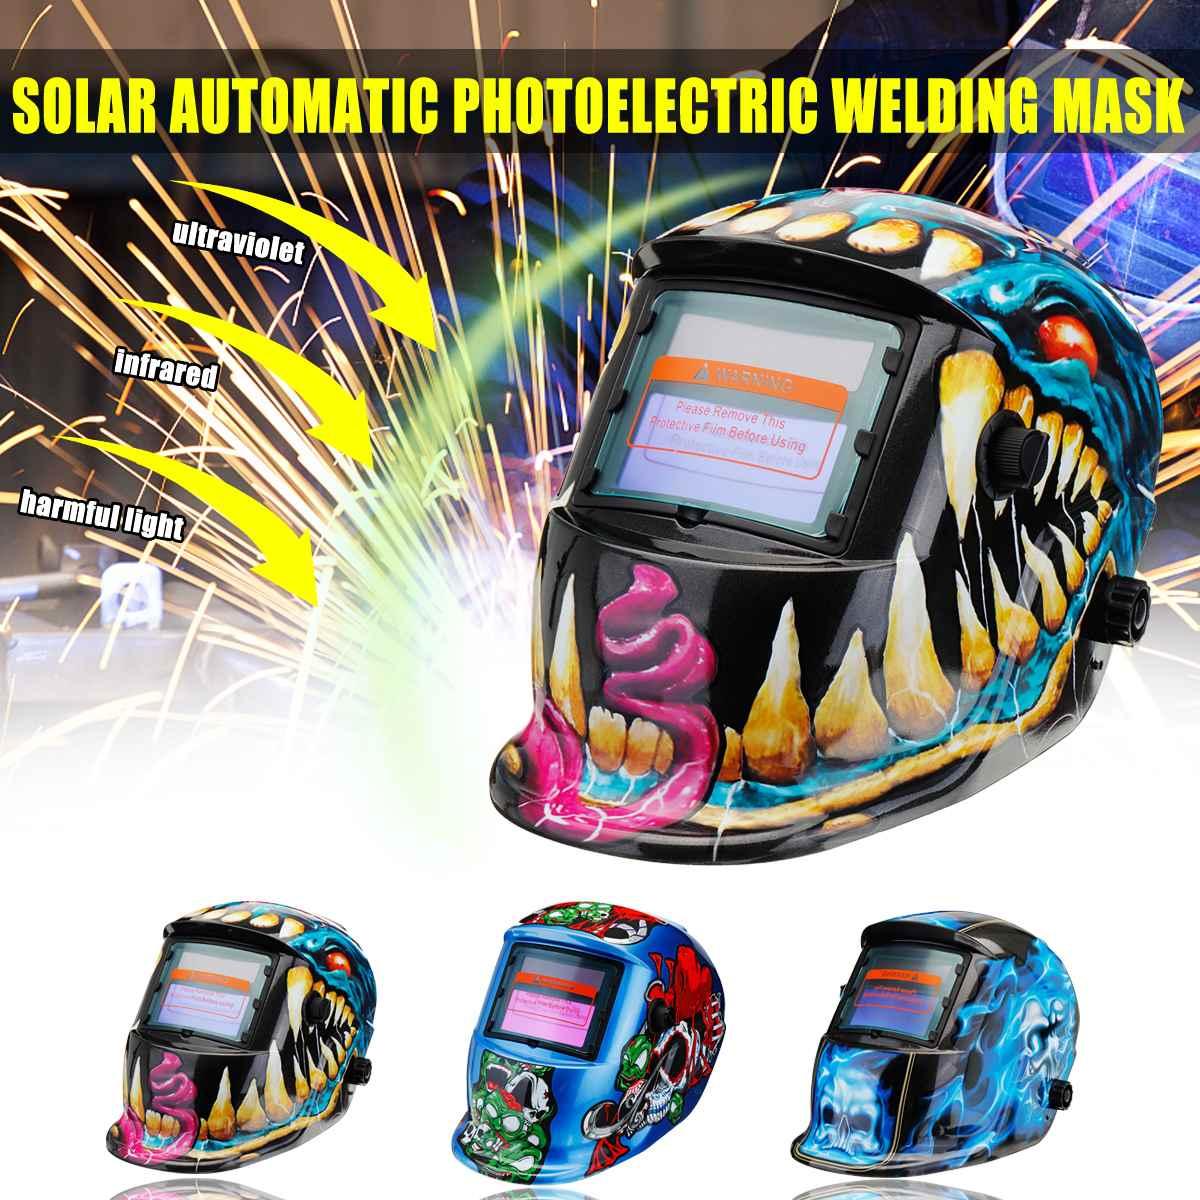 2020 New Solar Automatic Photoelectric Welding Mask Helmet Welding Caps Solar Power Welding Helmets Adjustable Headband